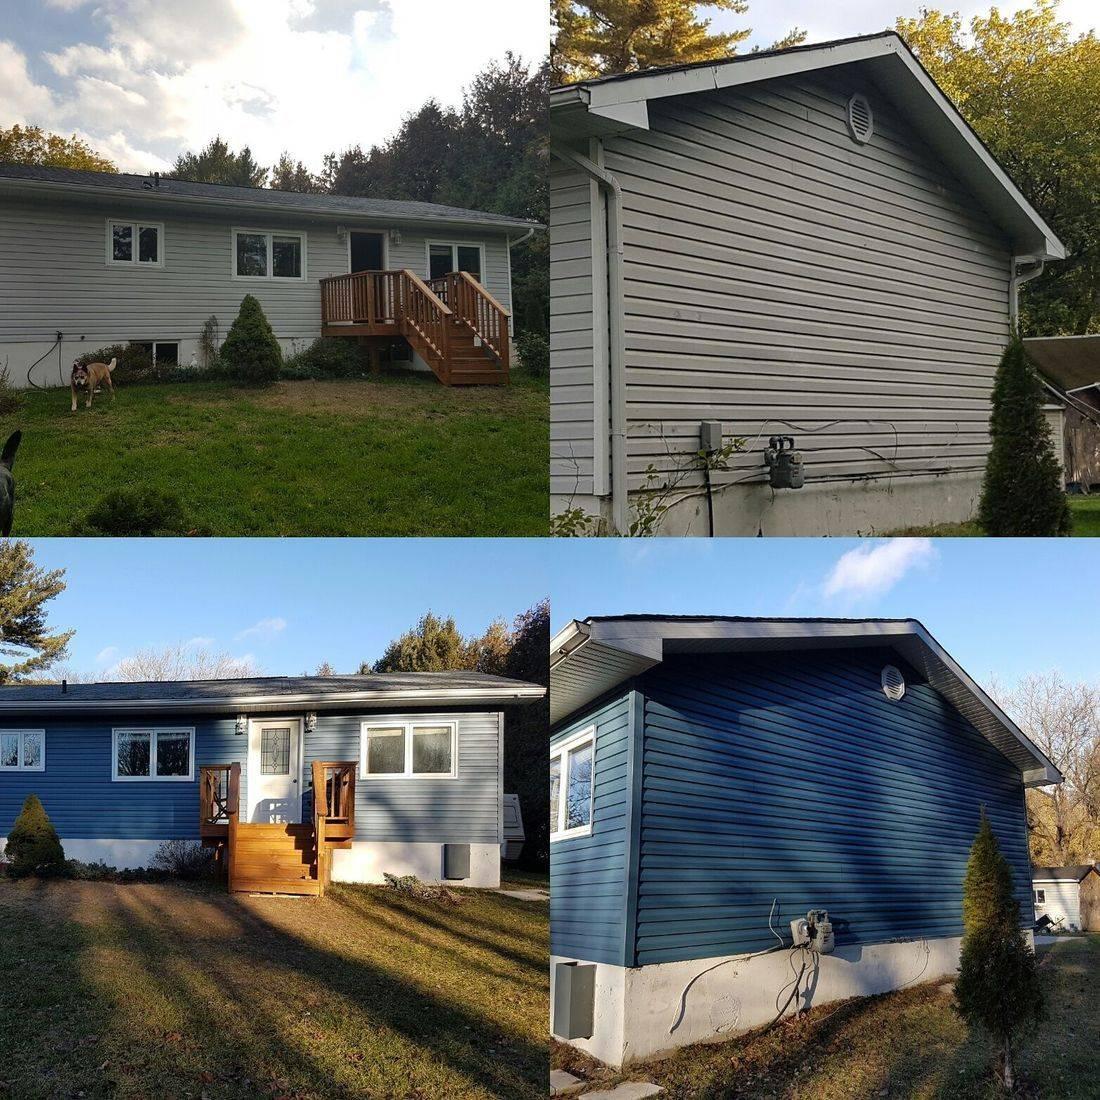 Exterior Renovations, Muskoka, Siding, Contractor, Carpenter, Decks